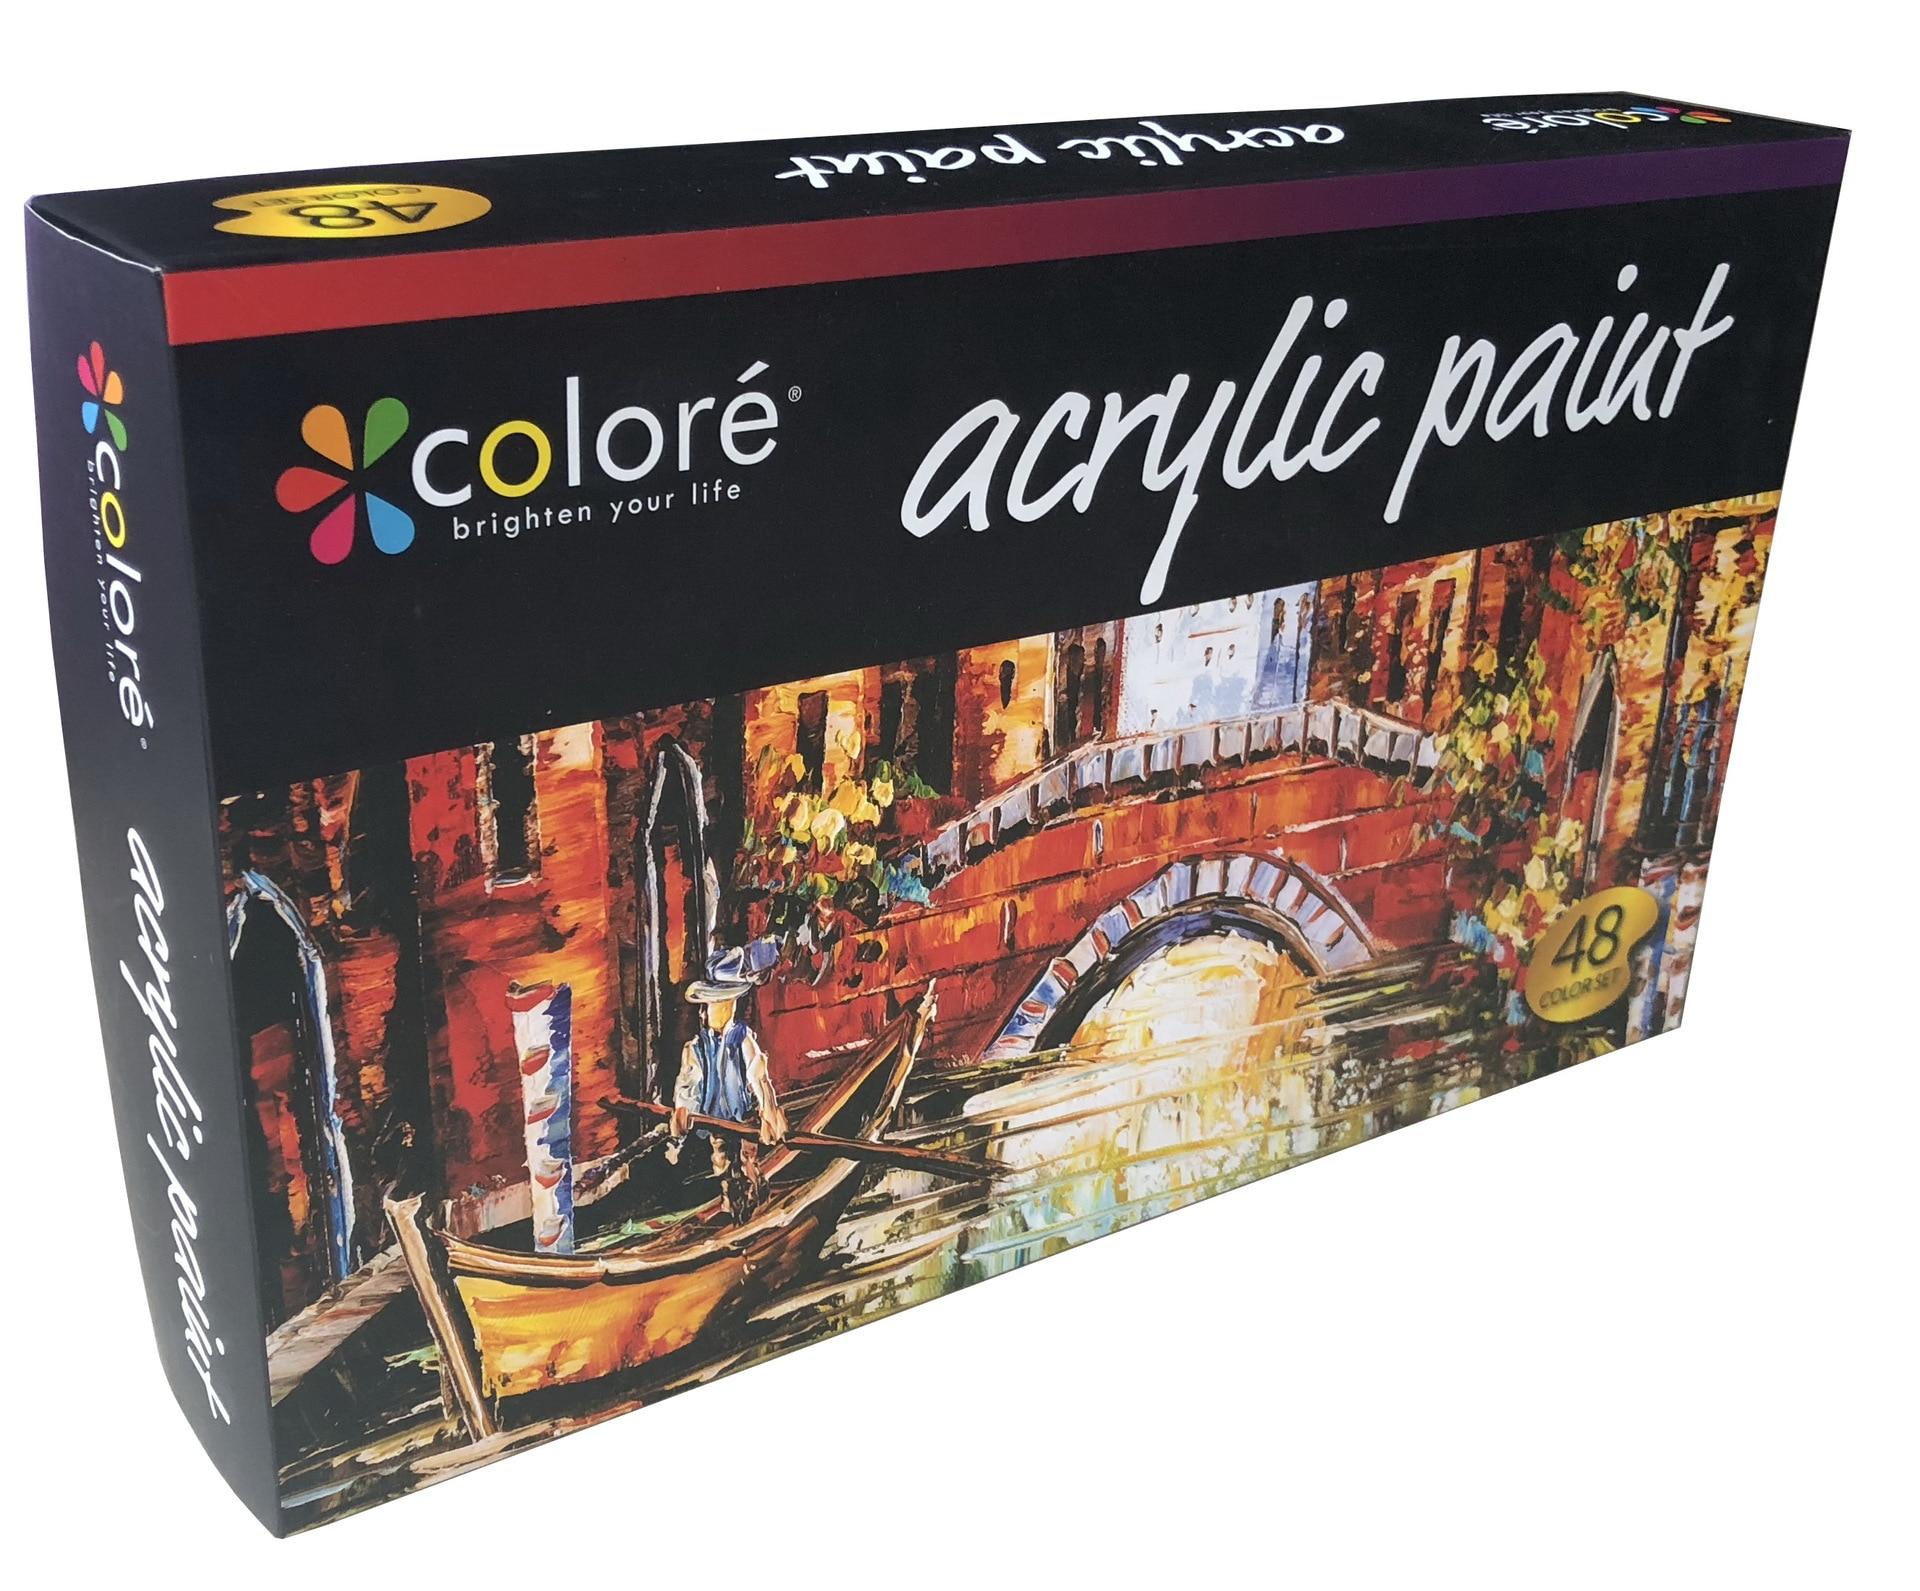 48 Pcs/box Acrylic Pigment  22 Ml Aluminum Tube Acrylic Pigment Set Painter Students Professional Painting Art Set with Bruses enlarge